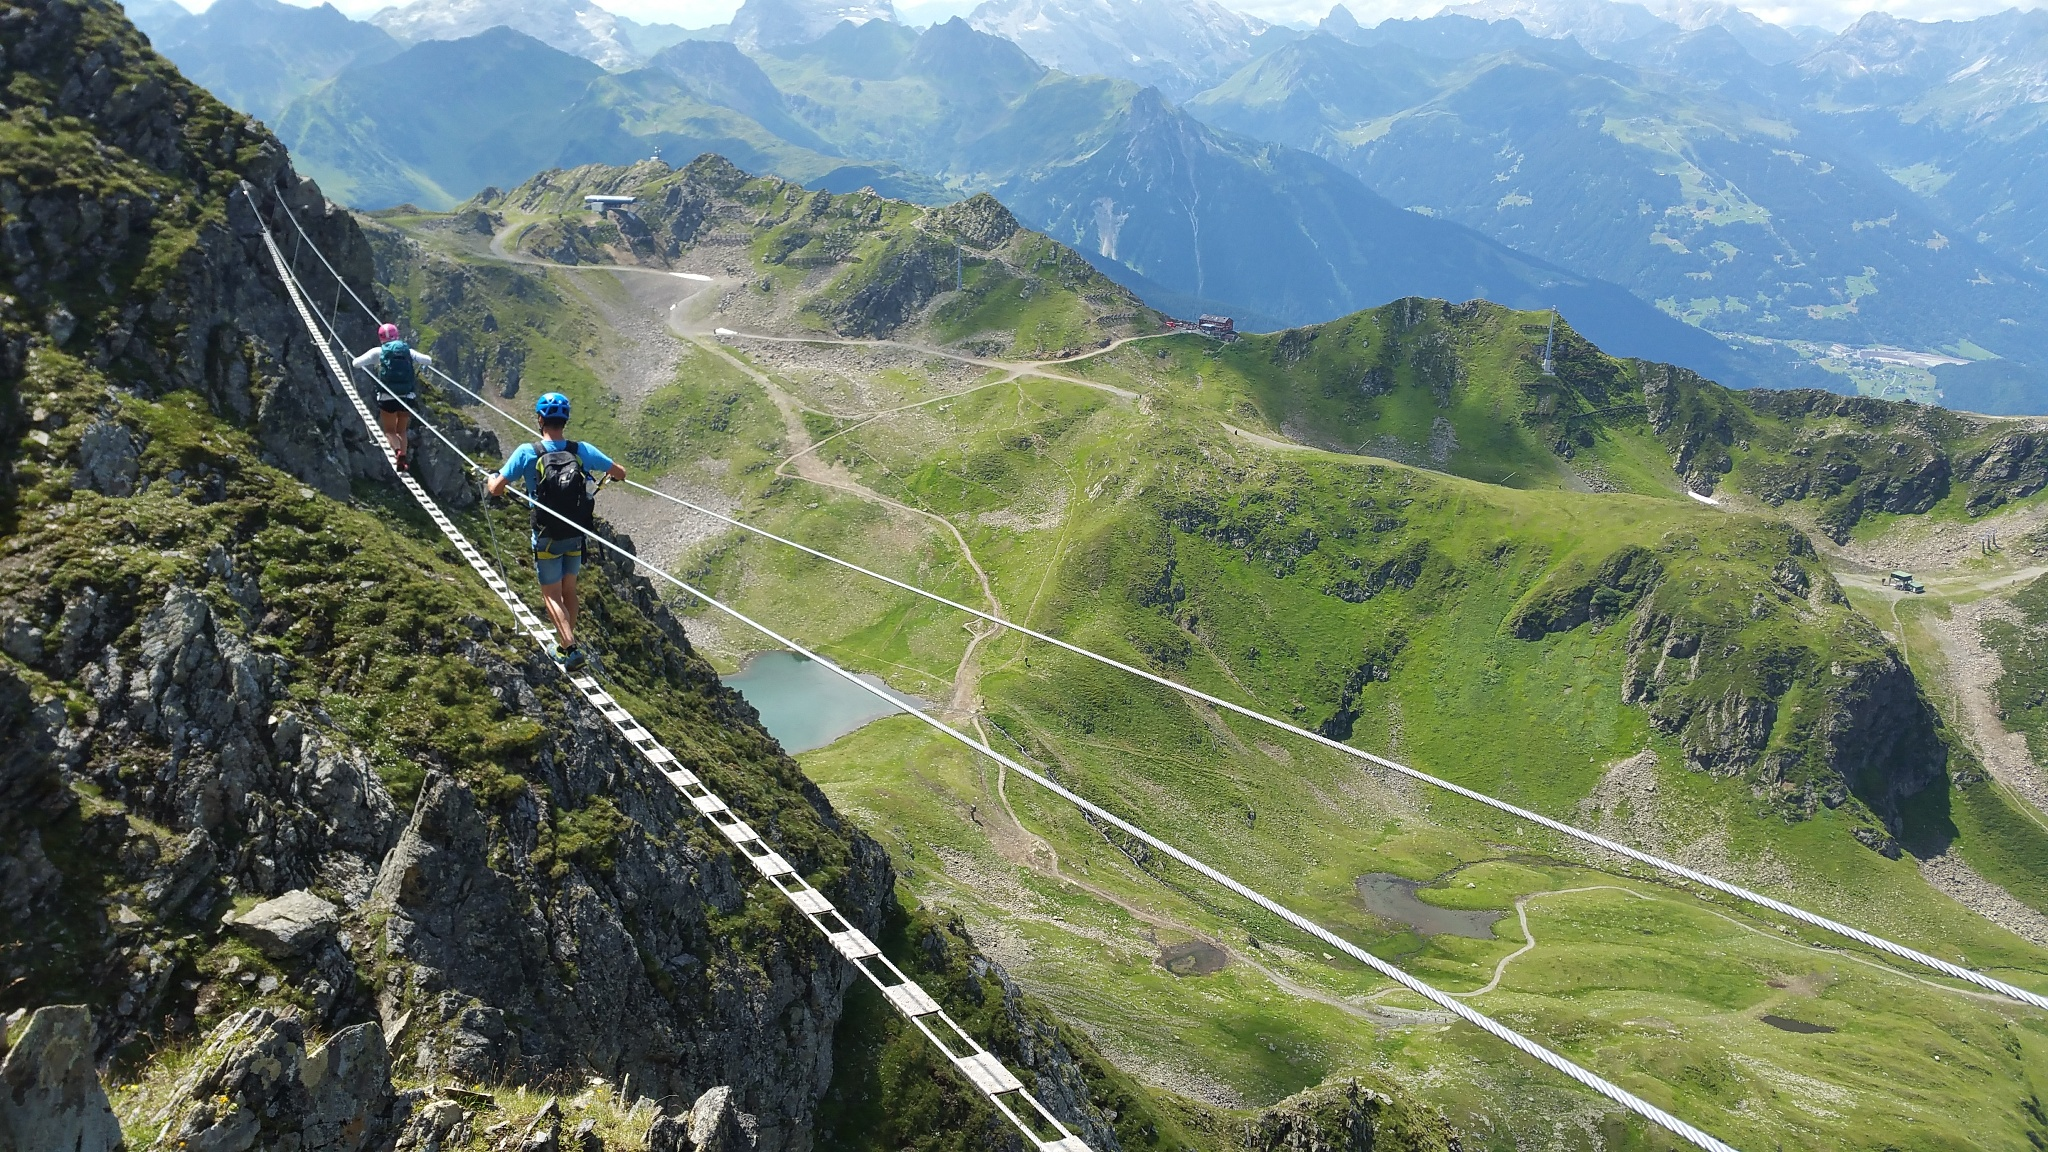 Klettersteig Hochjoch : Klettersteig hochjoch Österreichs wanderdörfer